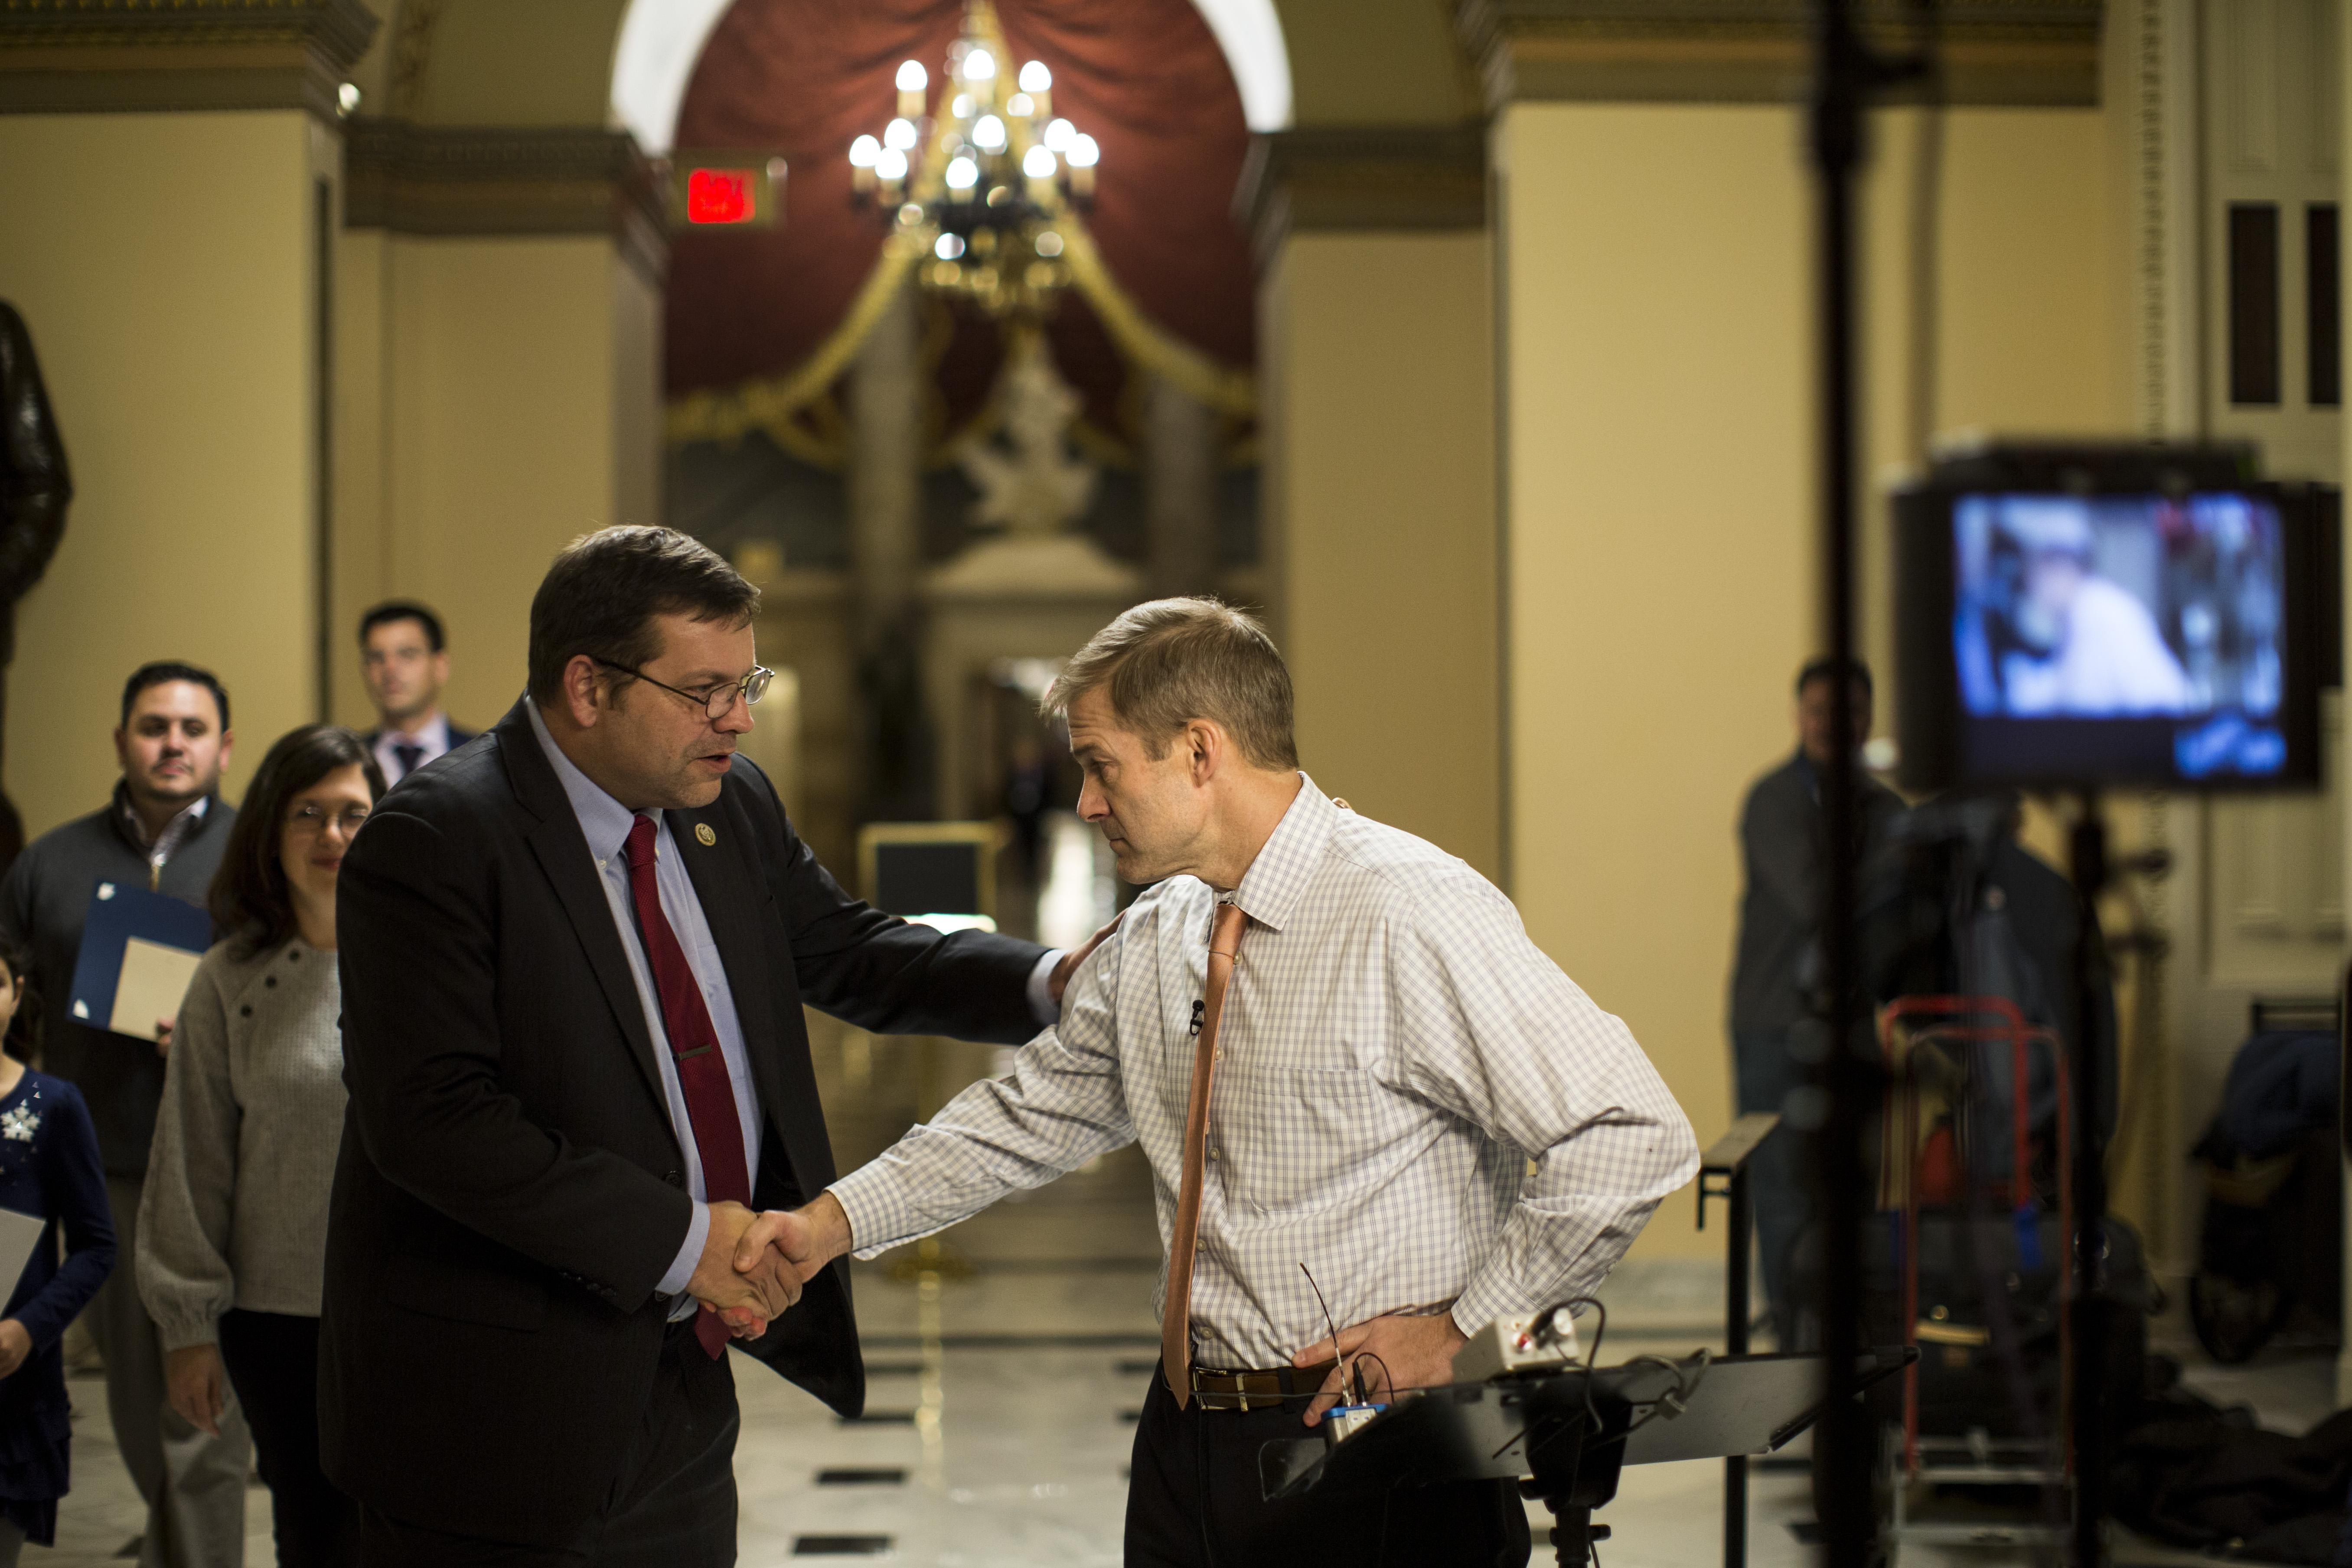 Tom Garrett grabs the shoulder of and shakes hands with Jim Jordan.